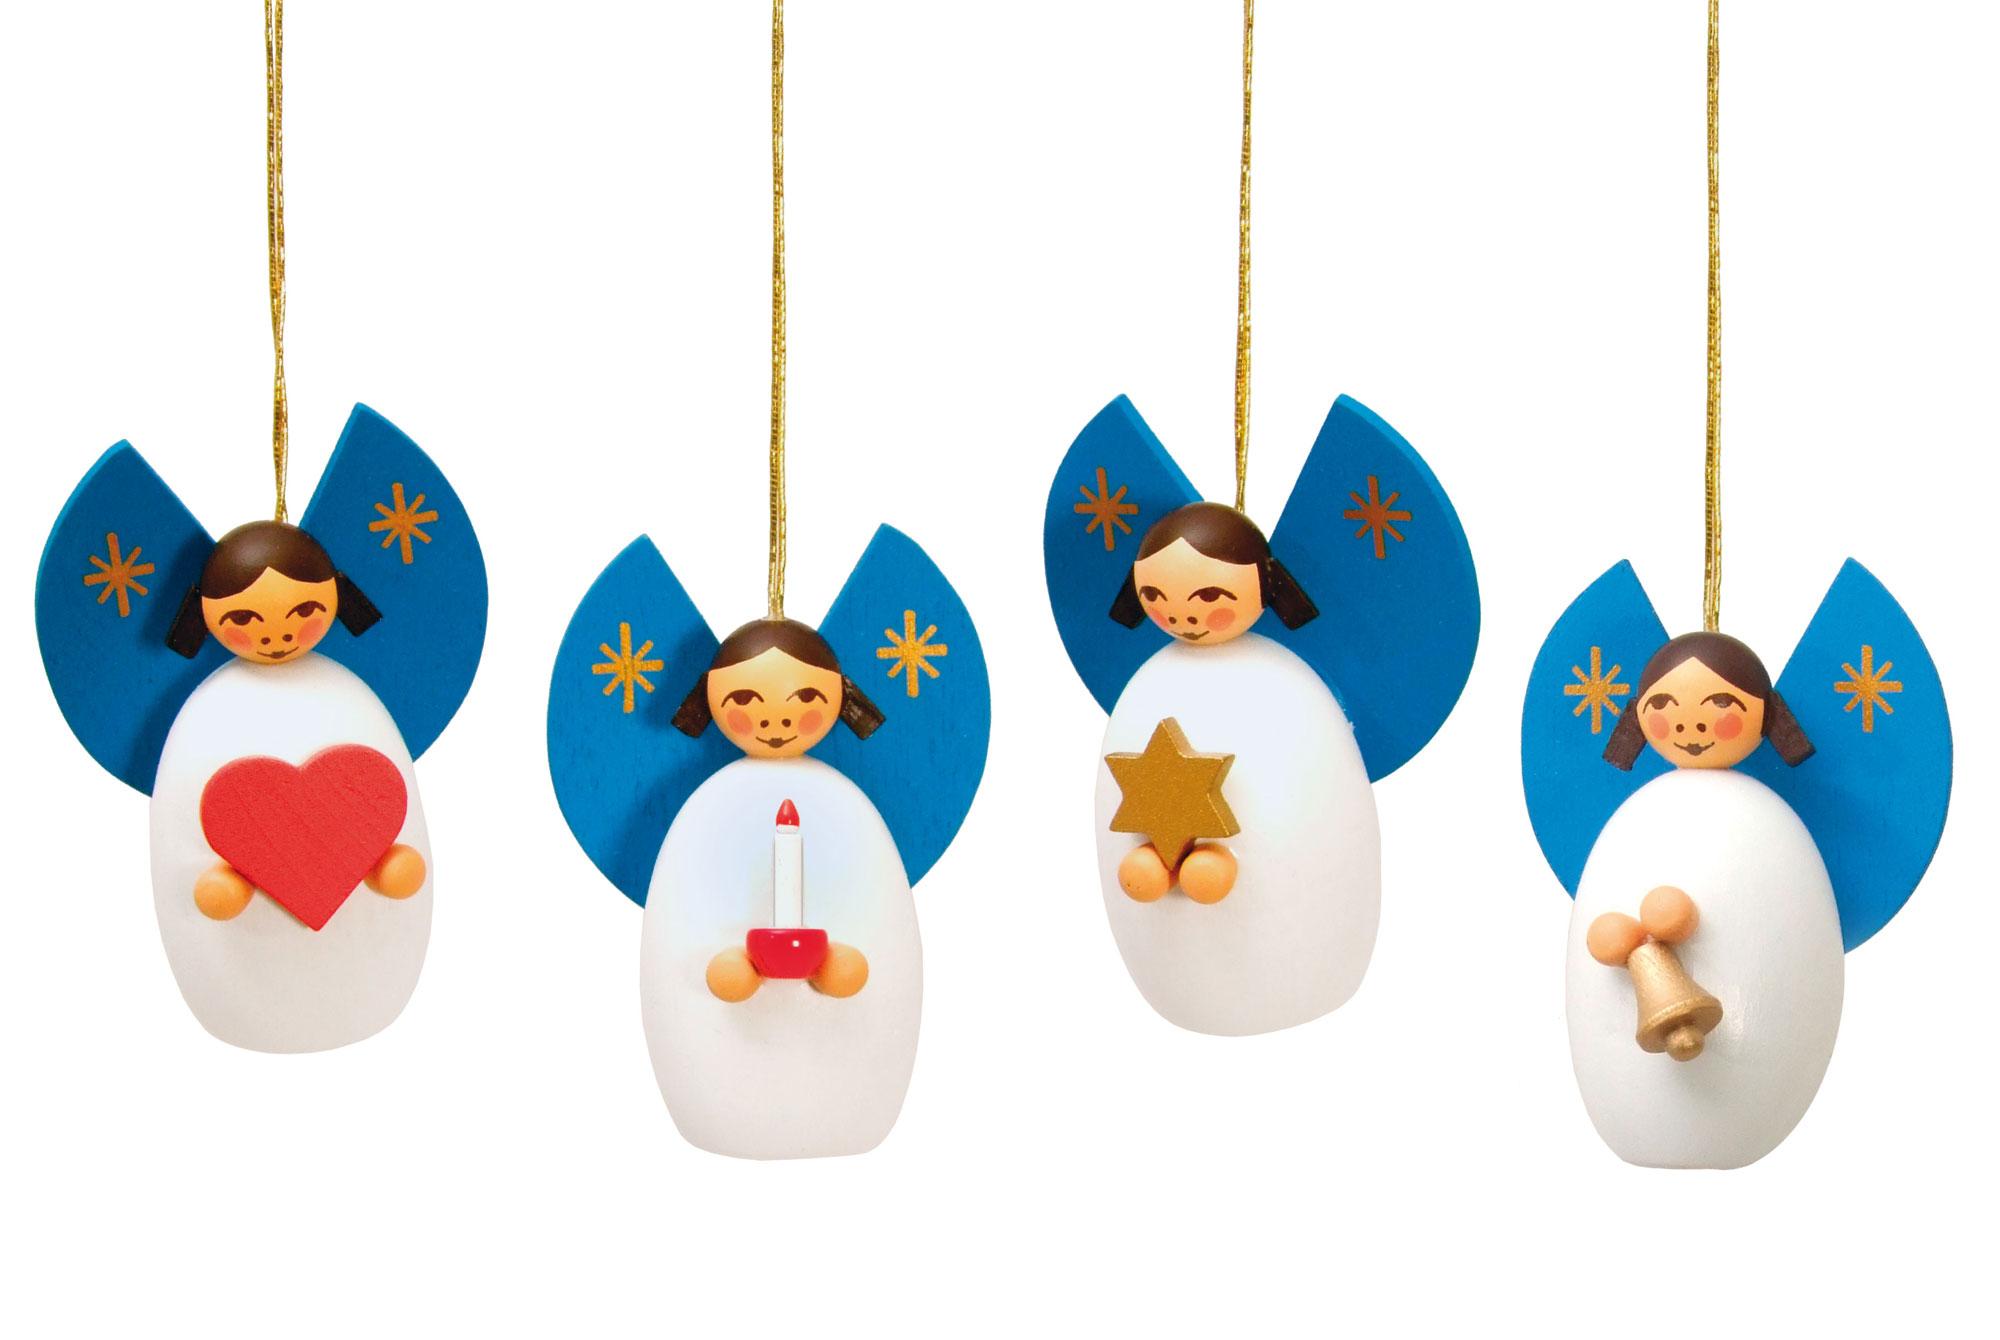 Baumbehang-Set:  4 Engel mit Stern, Kerze, Glocke, Herz